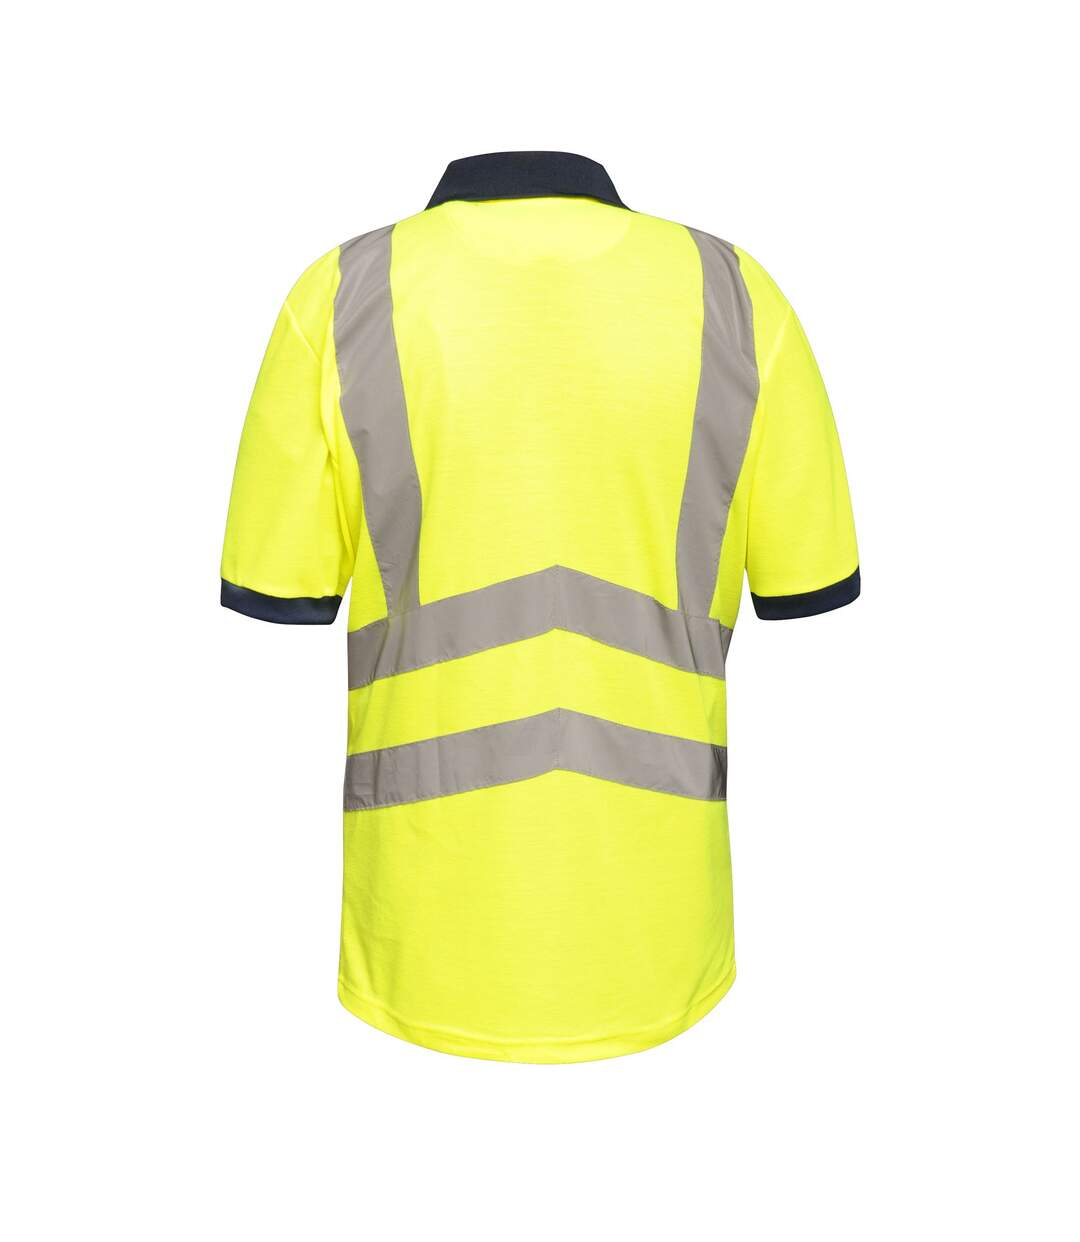 Regatta Mens Hi Vis Pro Reflective Work Polo Shirt (Yellow/Navy) - UTRG3983